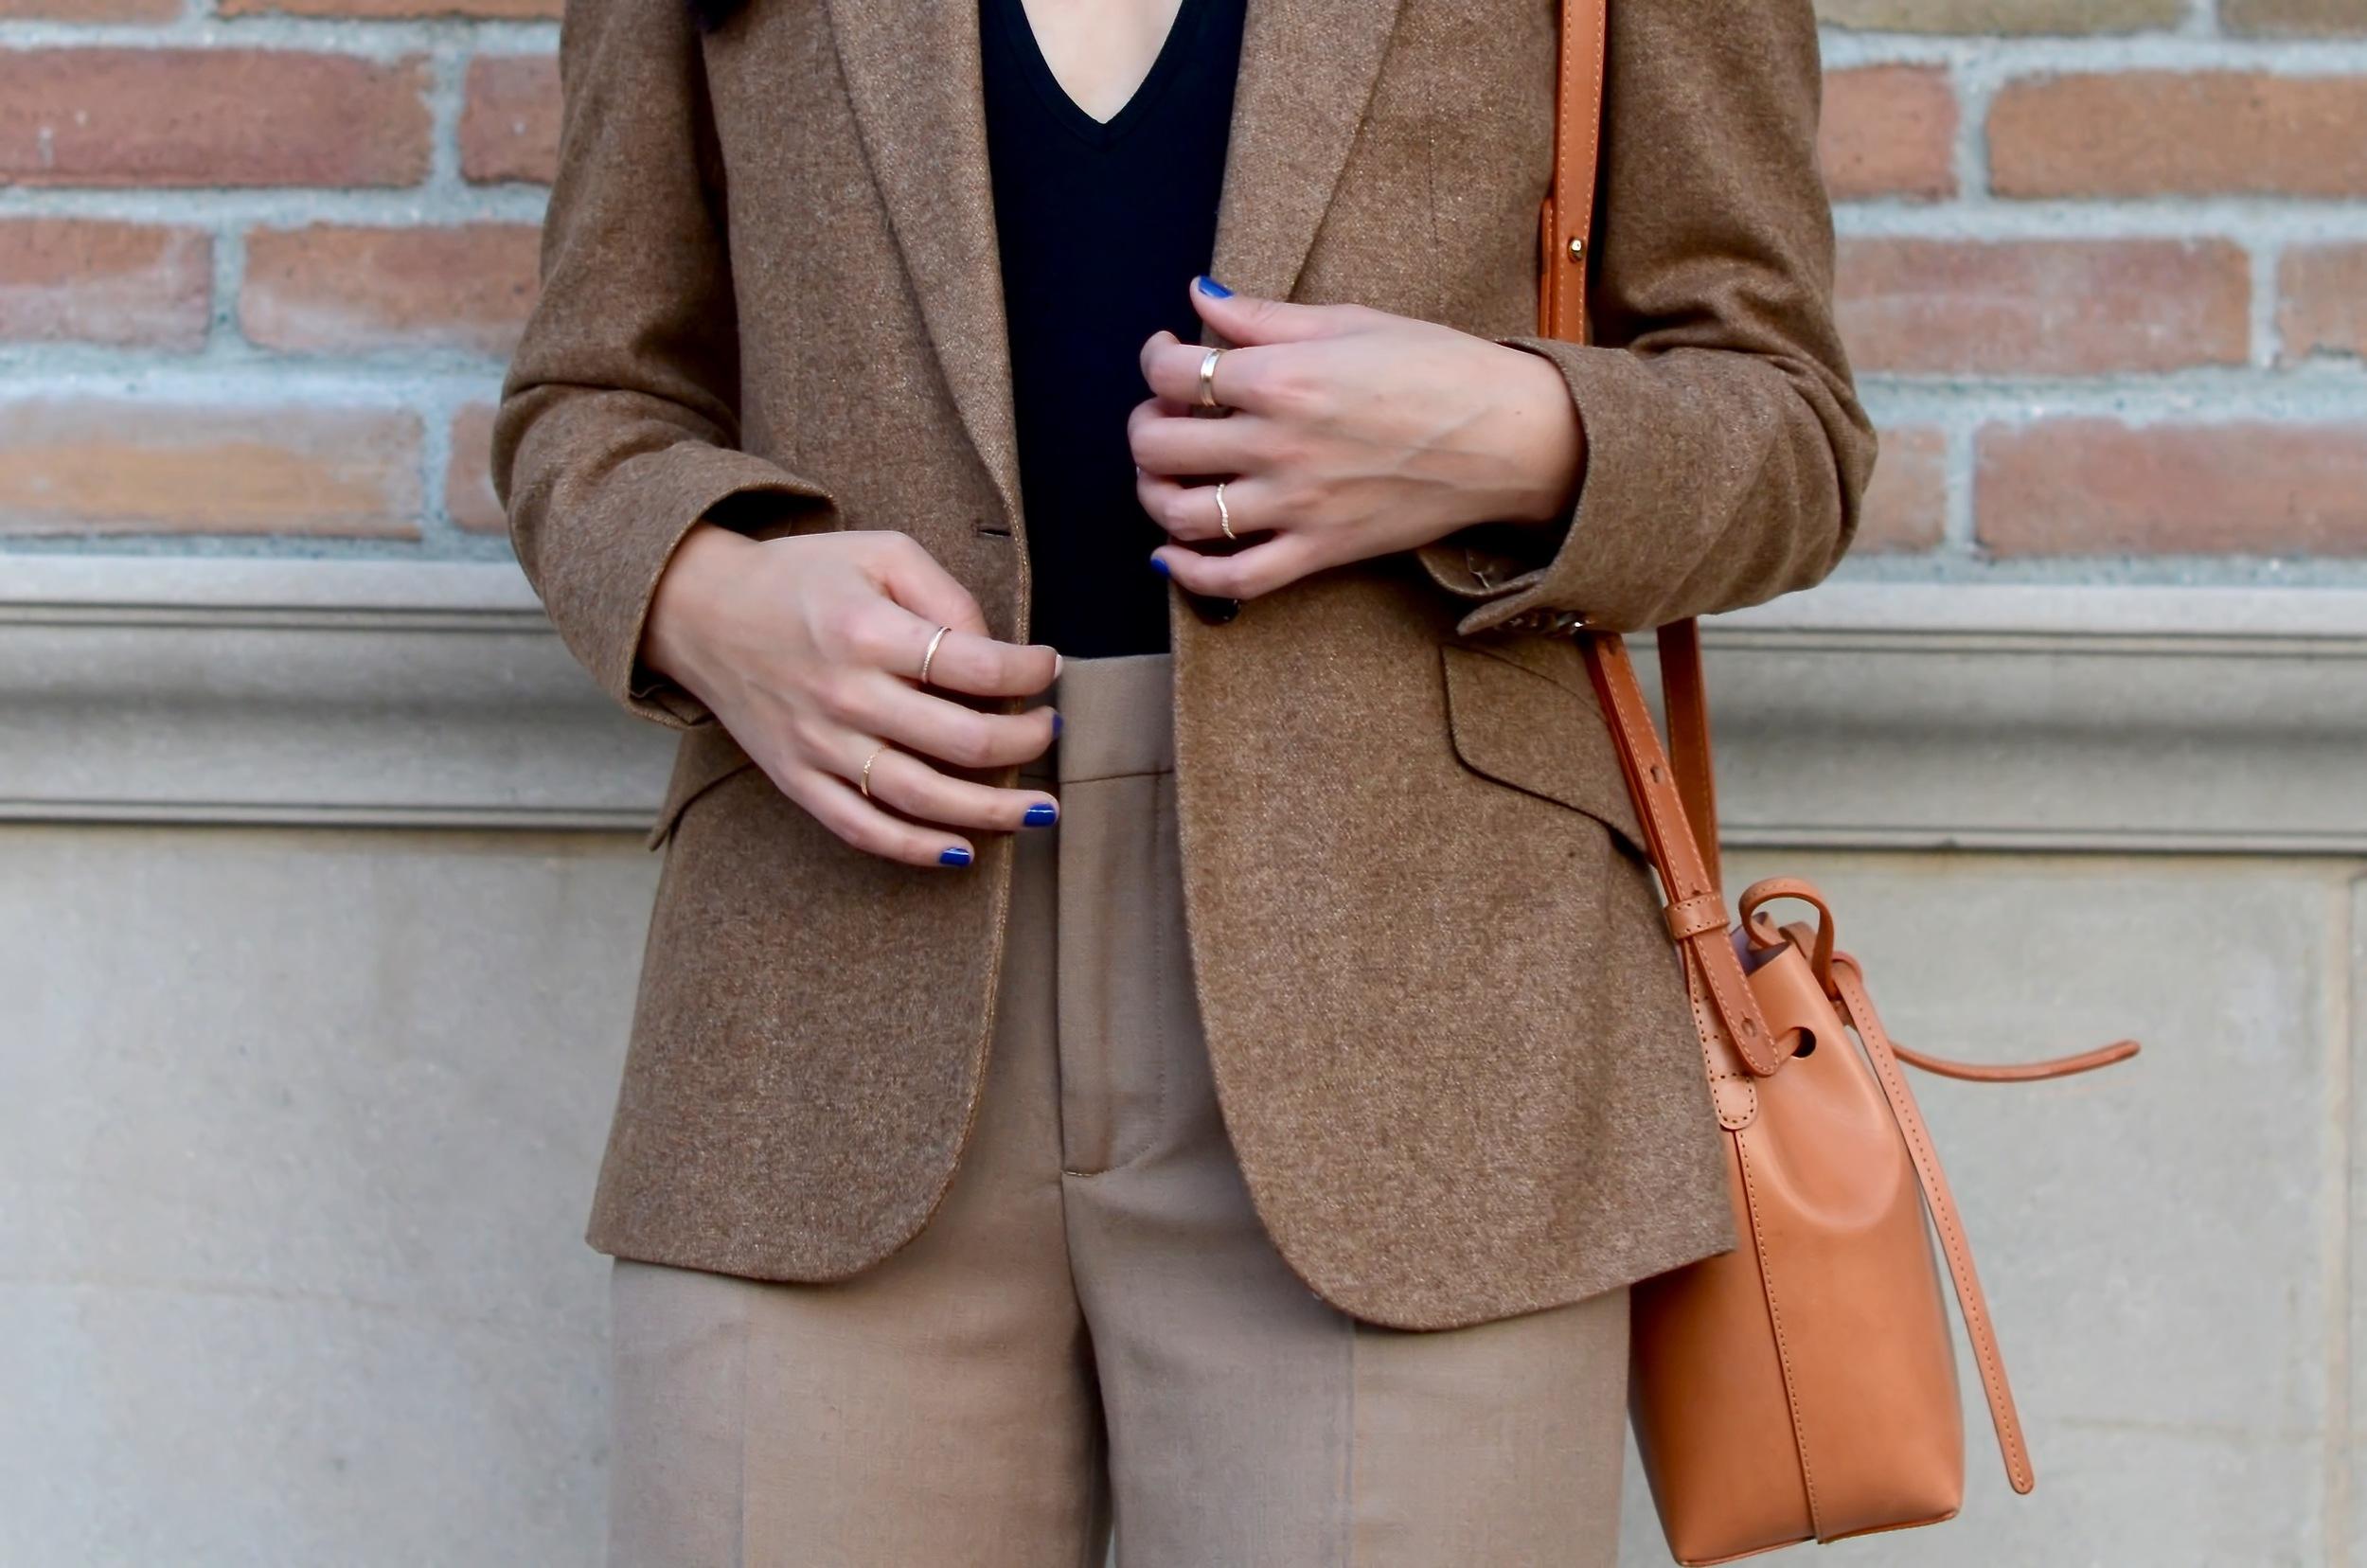 Just Goh With It-Outfit-shopstyle-dressforsuccess-zara-camel-wide-leg-pants-massimo-dutti-blazer-mansur-gavriel-mini-bucket-bag-5.jpg